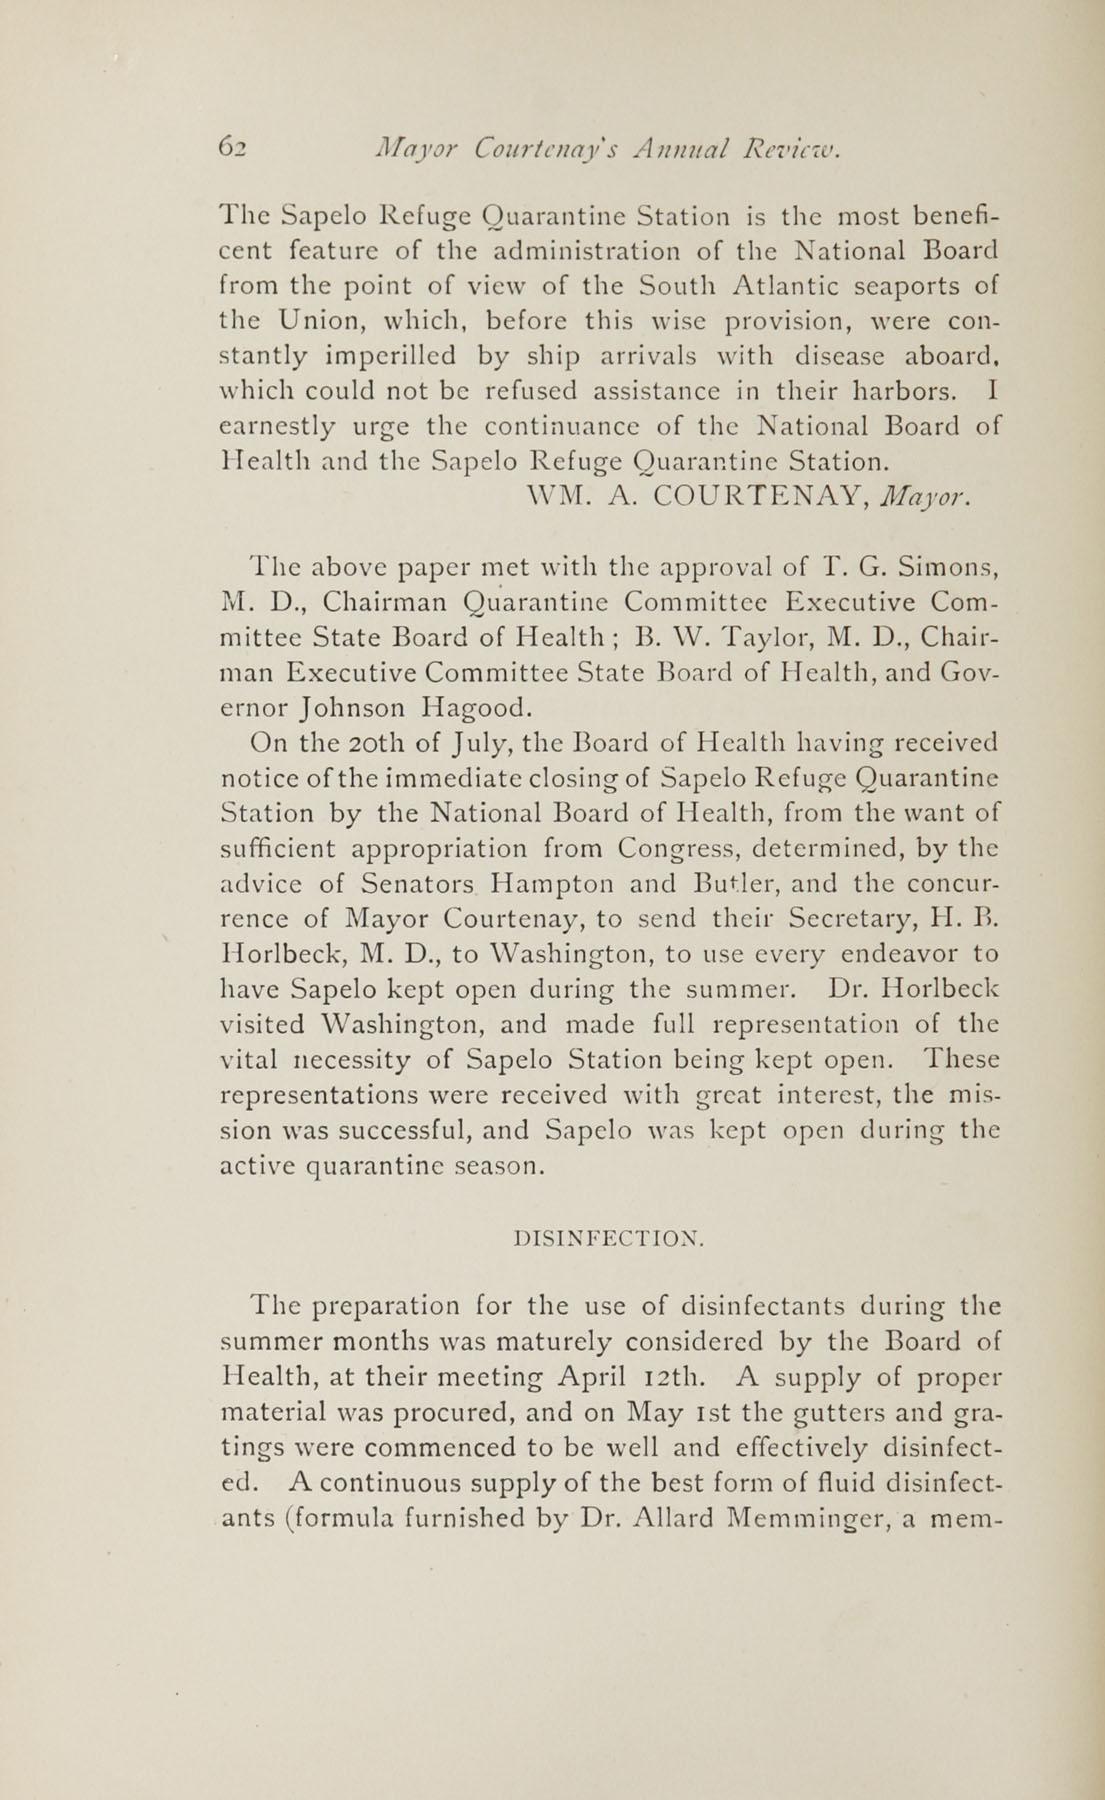 Charleston Yearbook, 1882, page 62